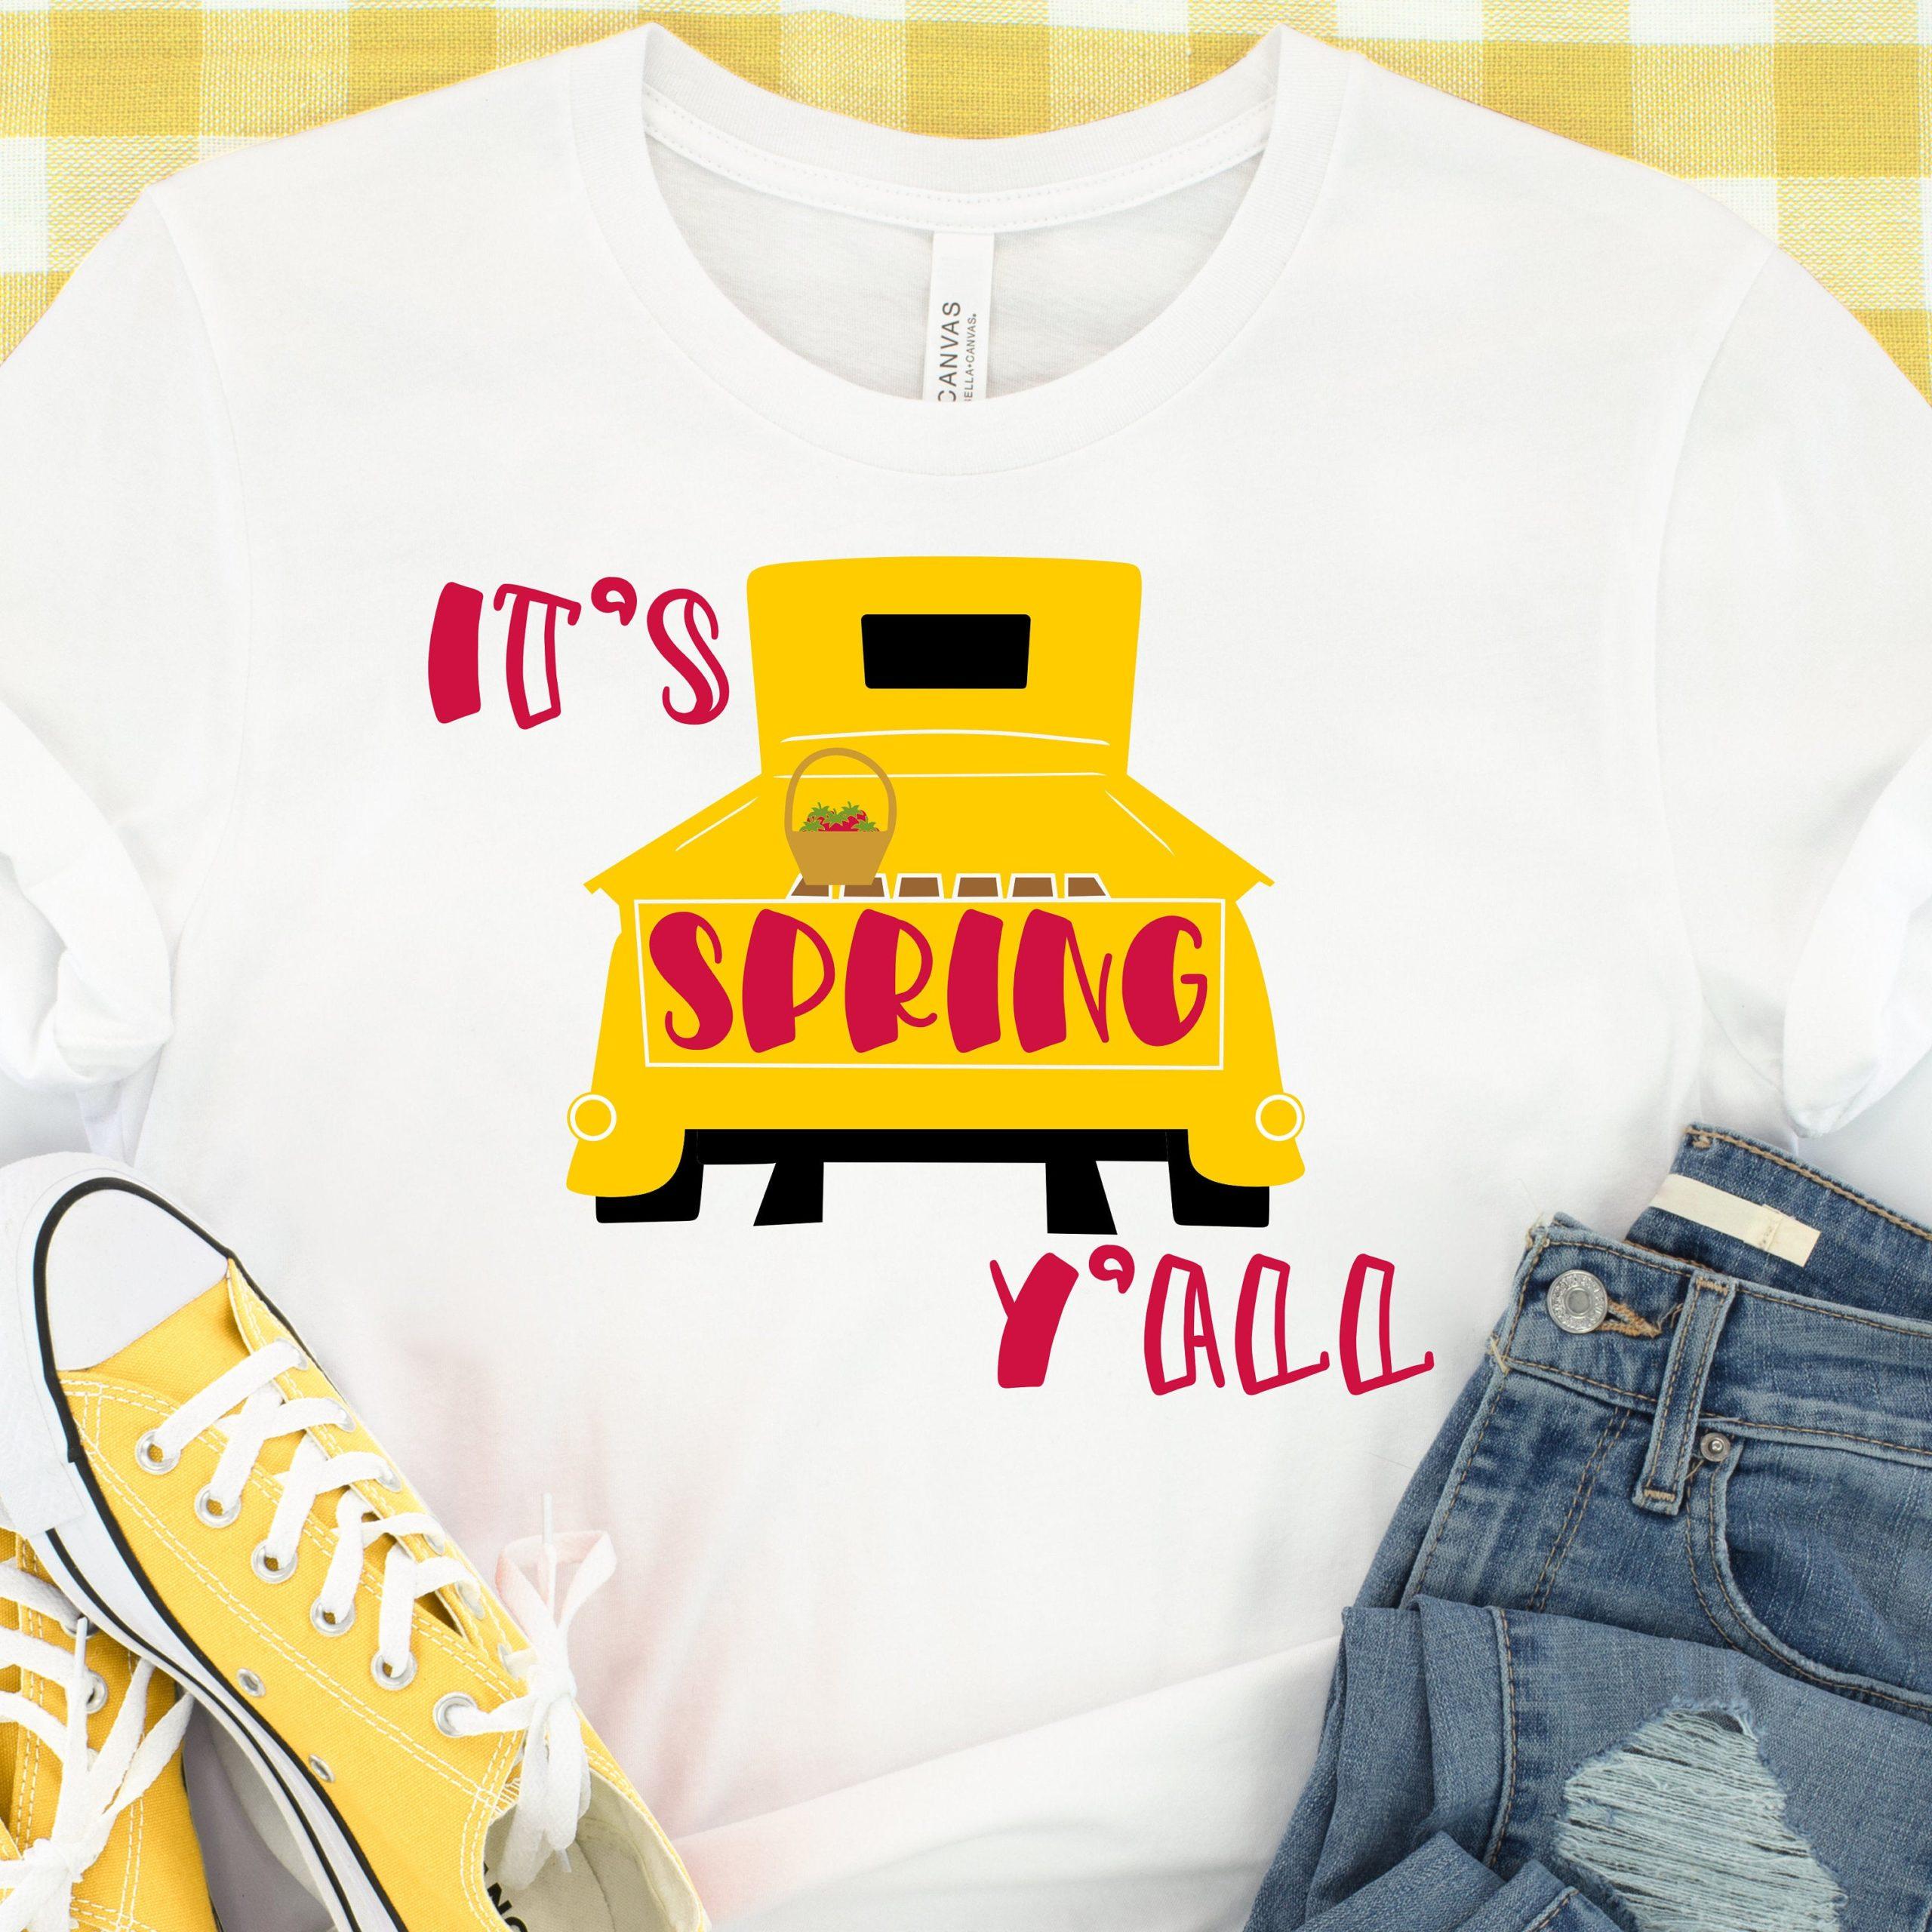 Spring-svg-its-spring-yall-svg-spring-truck-svg-vintage-truck-svg-easter-truck-svg-spring-svg-design-spring-cut-file-spring-cricut-60513b68